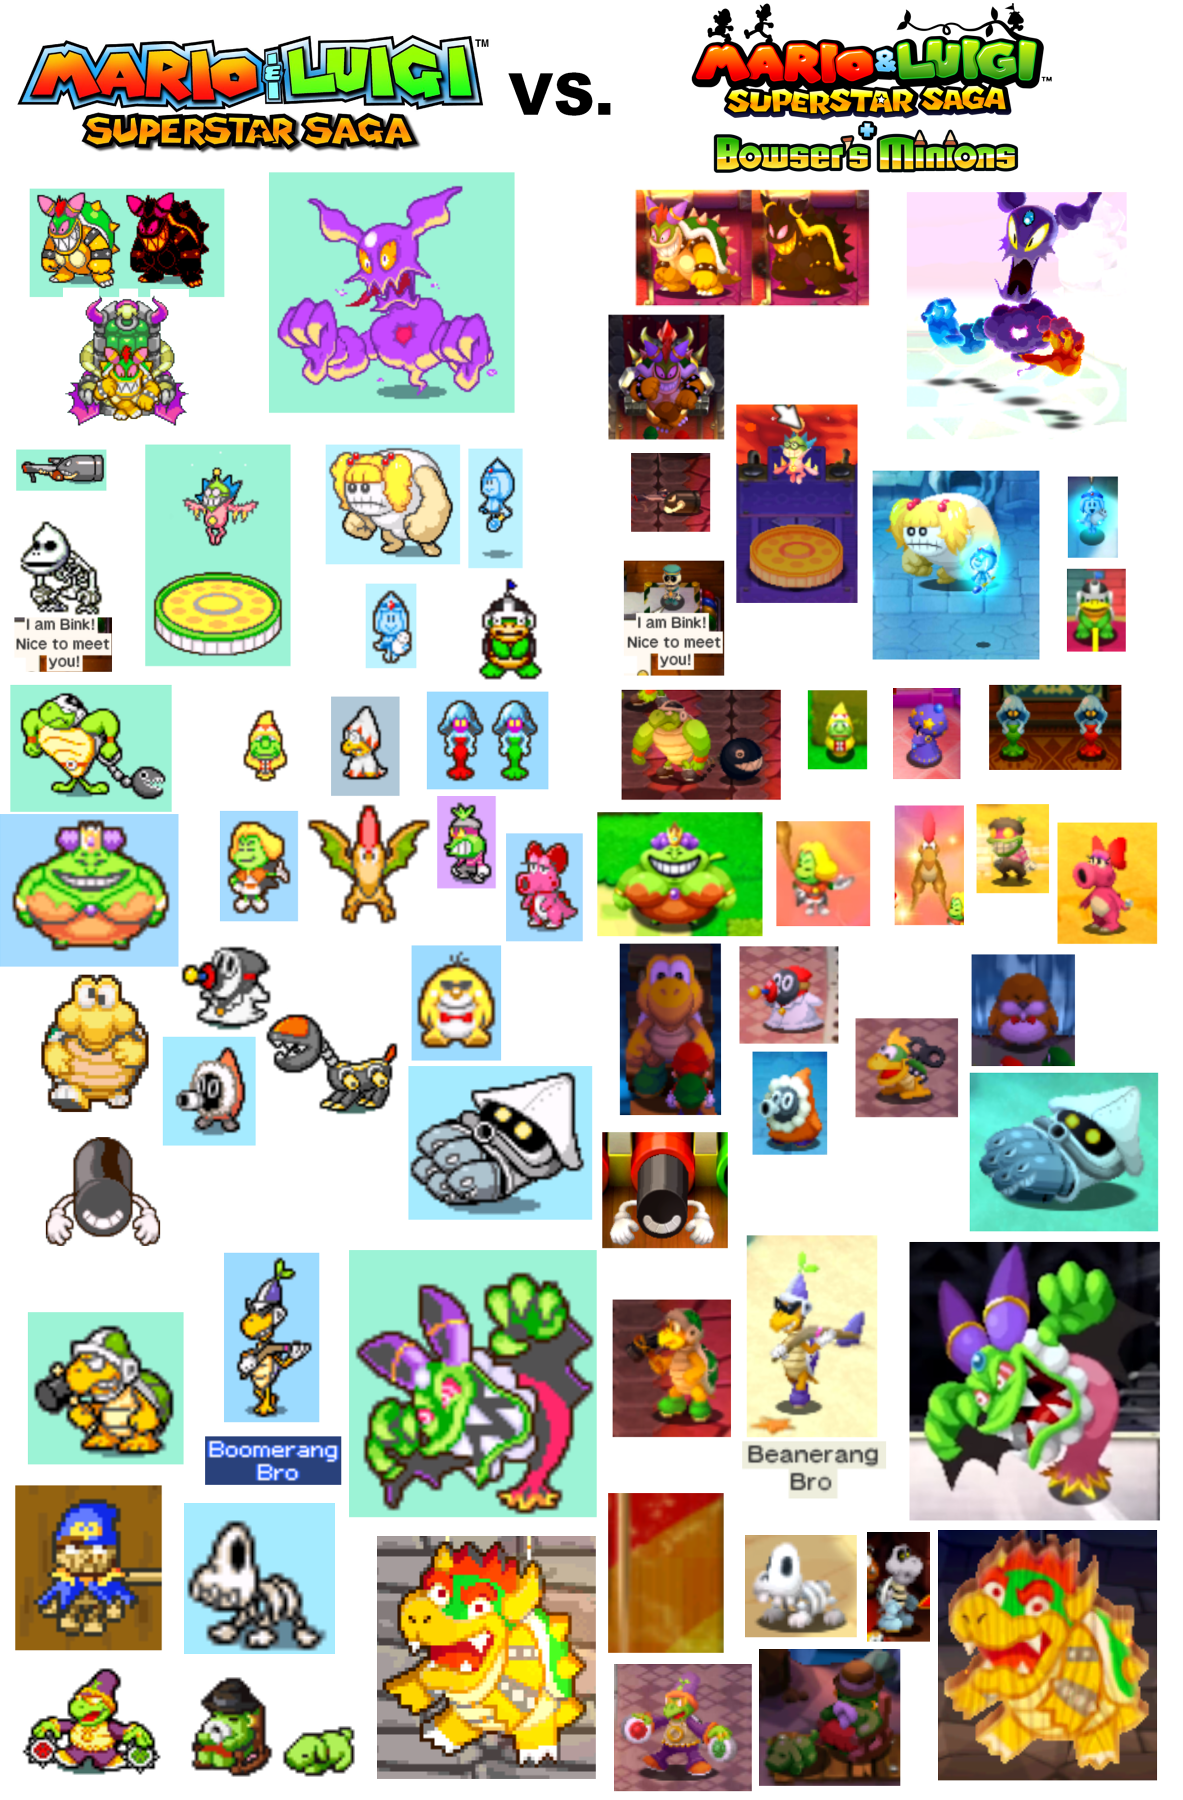 Mario Luigi Superstar Saga Vs Mario Luigi Superstar Saga